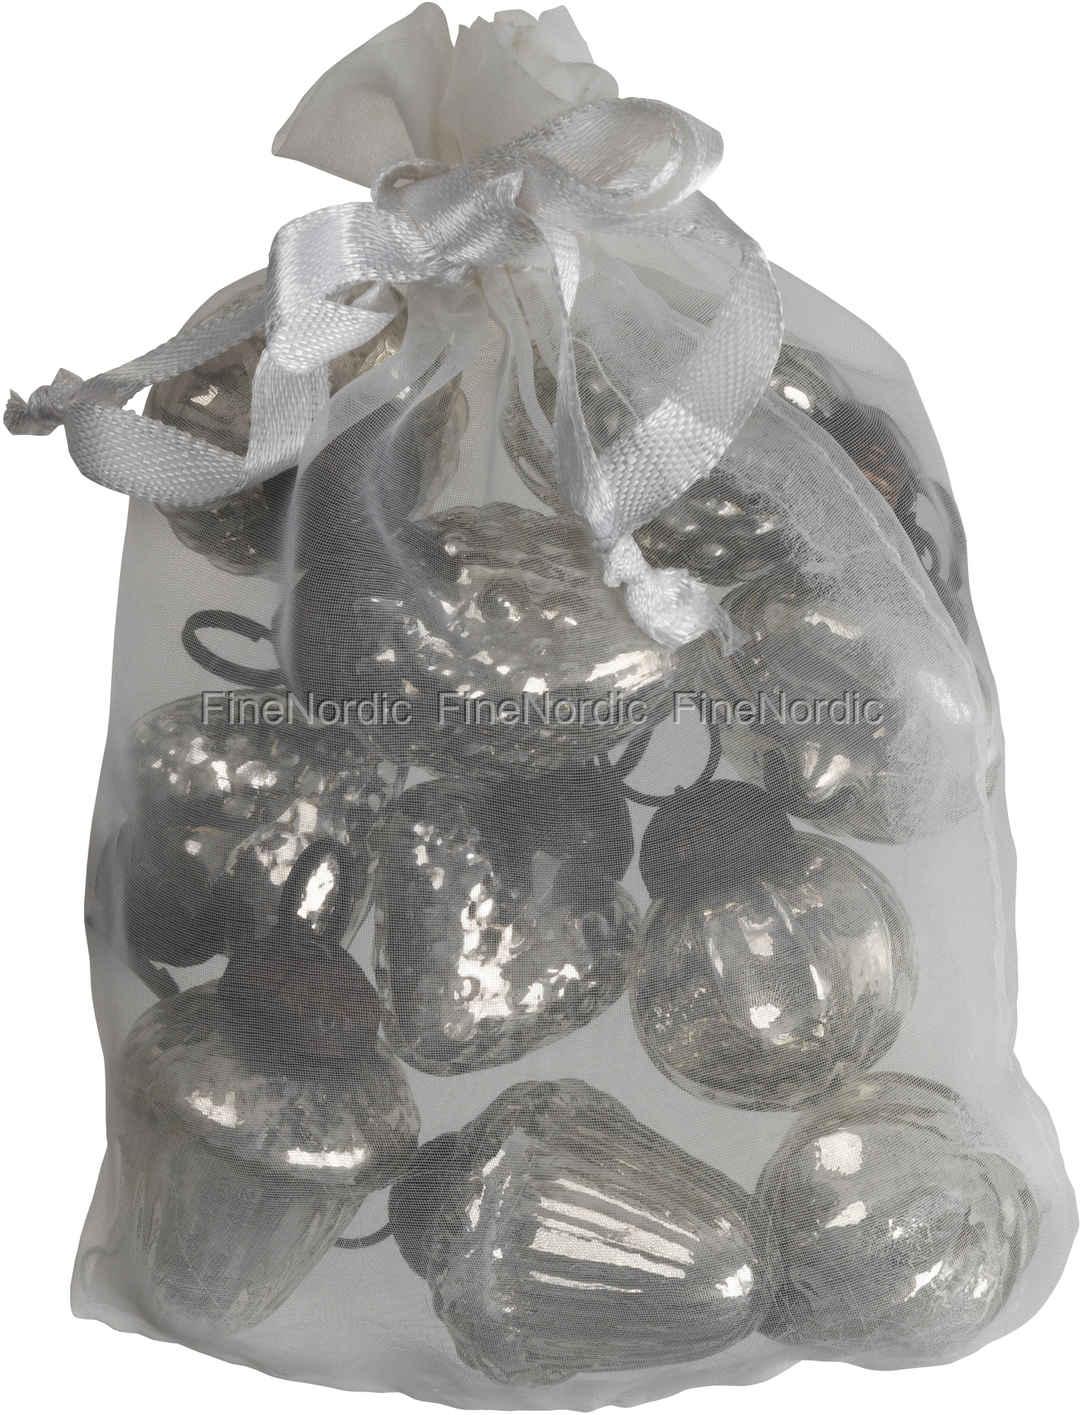 Mini Weihnachtskugeln.Ib Laursen Tüte Mit 10 Weihnachtskugeln Mini Silber